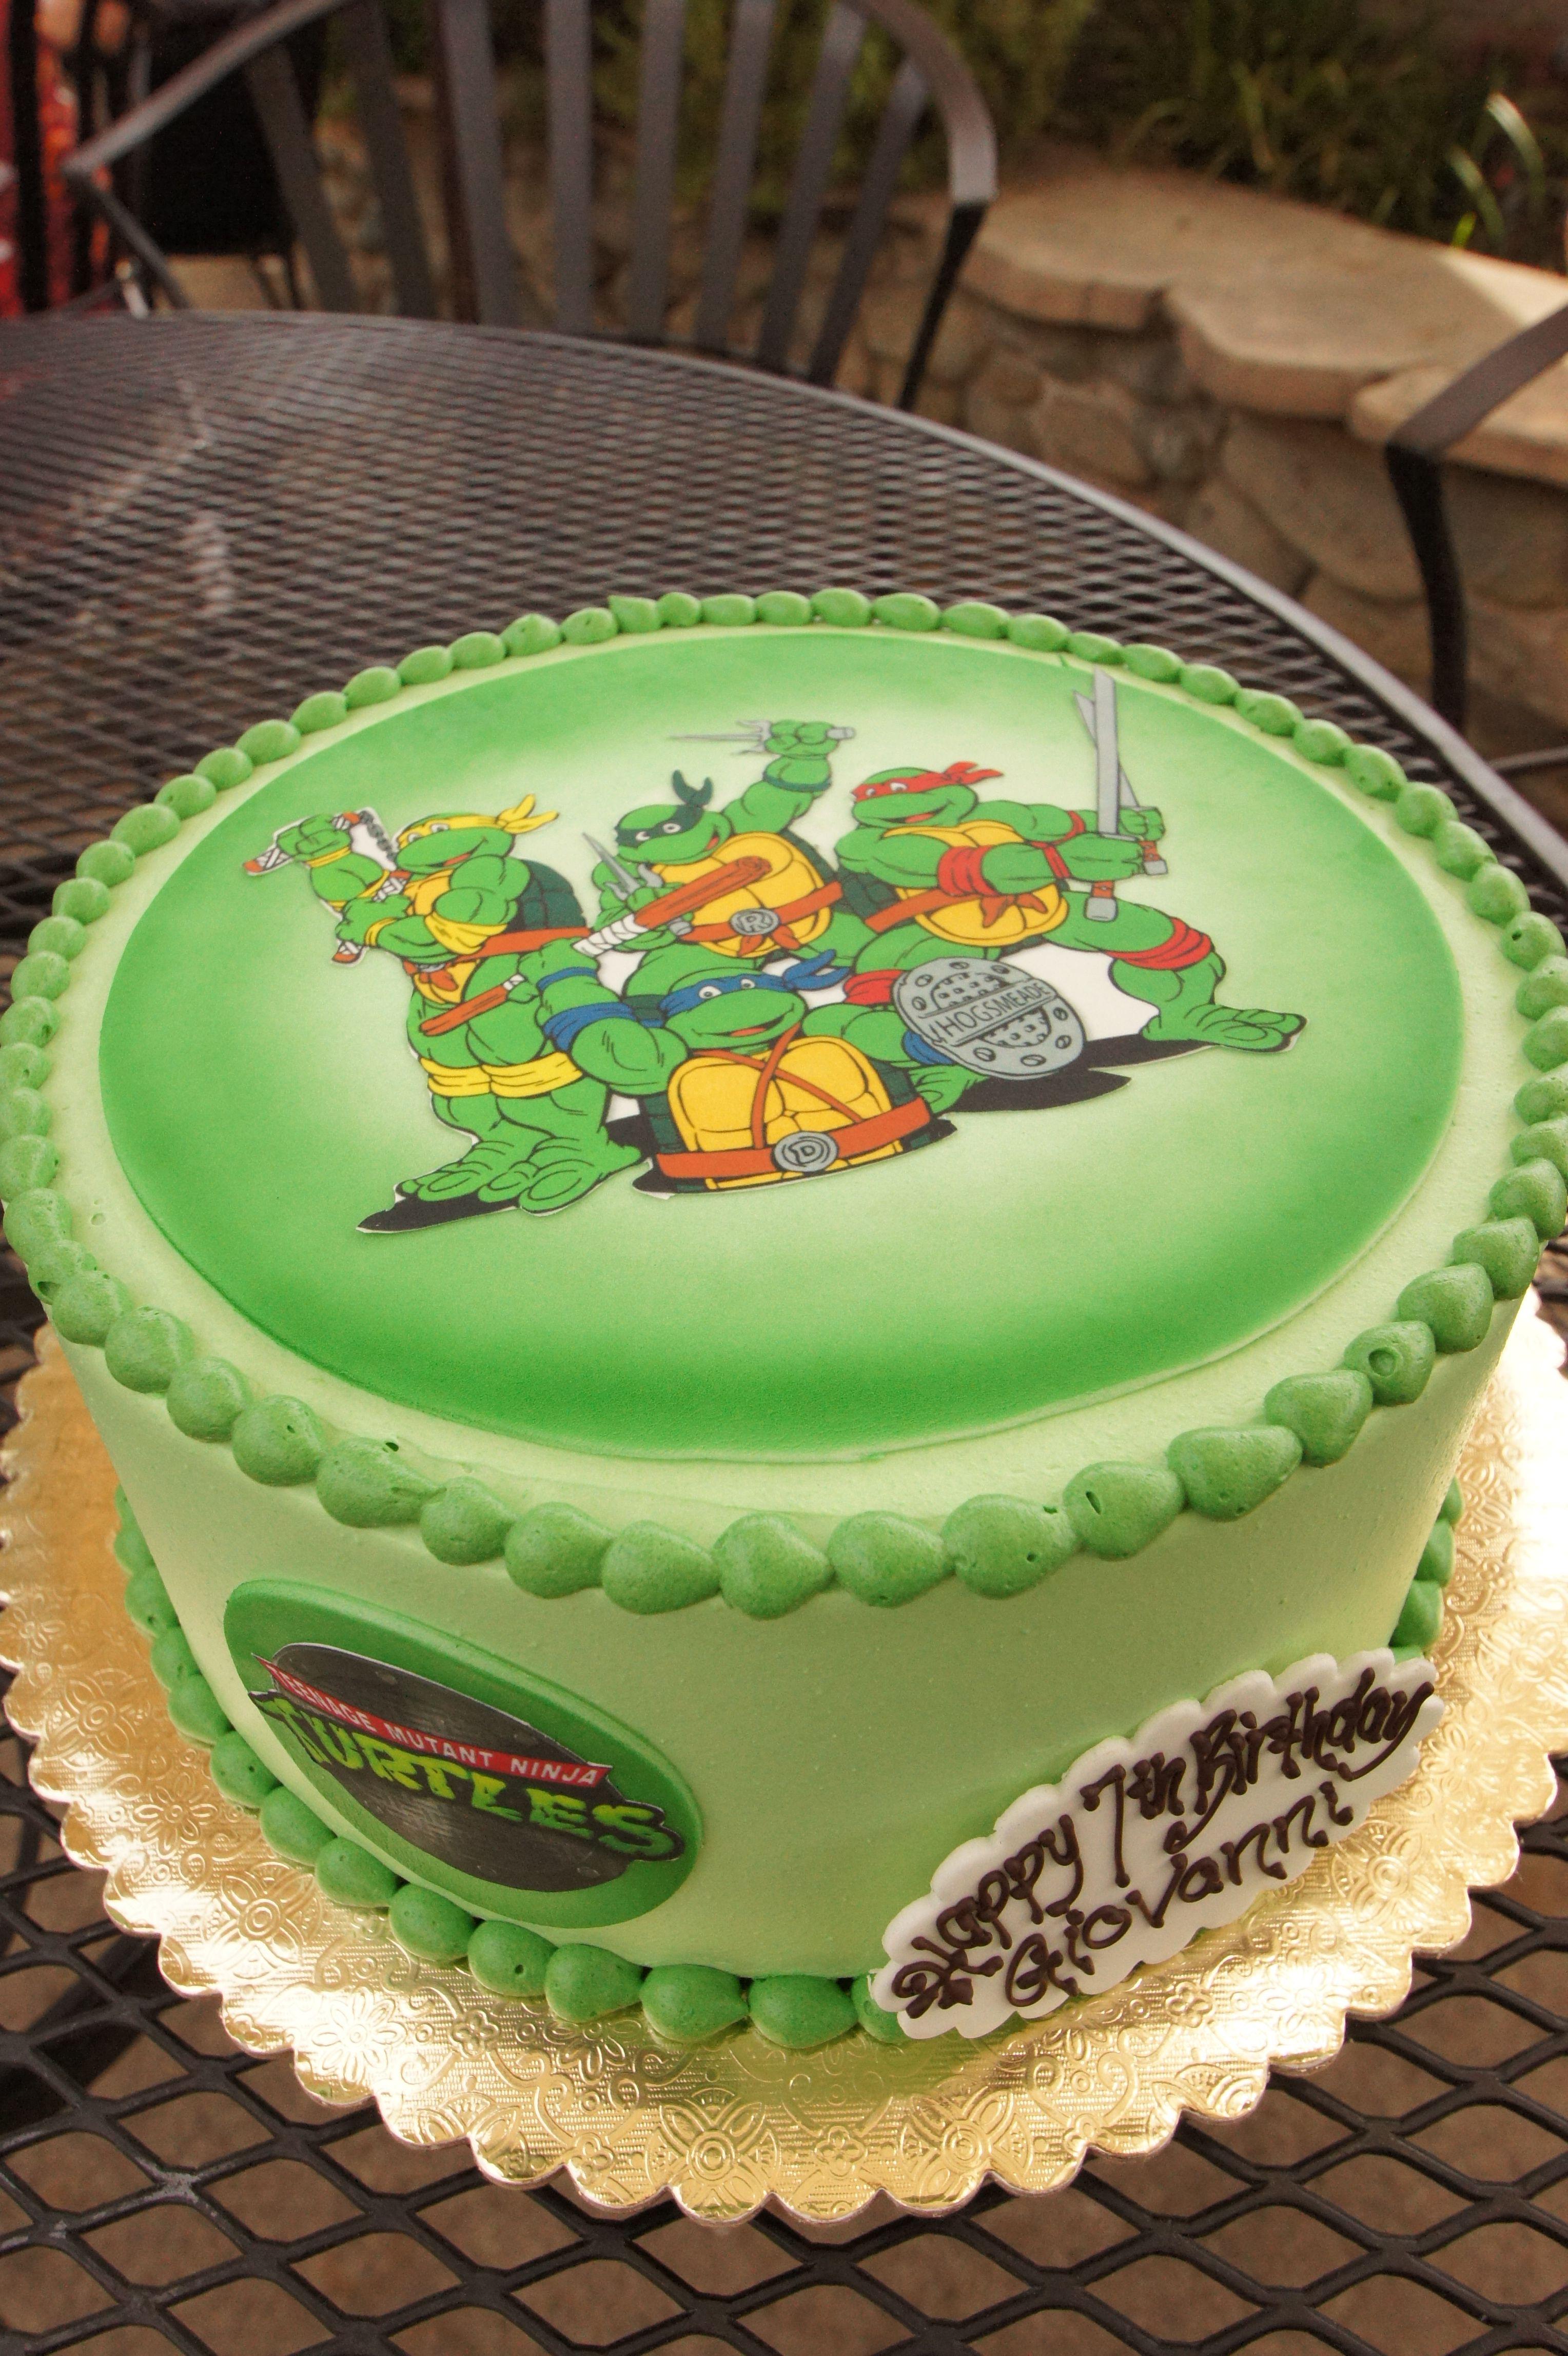 Groovy Green Edible Image Teenage Mutant Ninja Turtles Birthday Cake Funny Birthday Cards Online Bapapcheapnameinfo